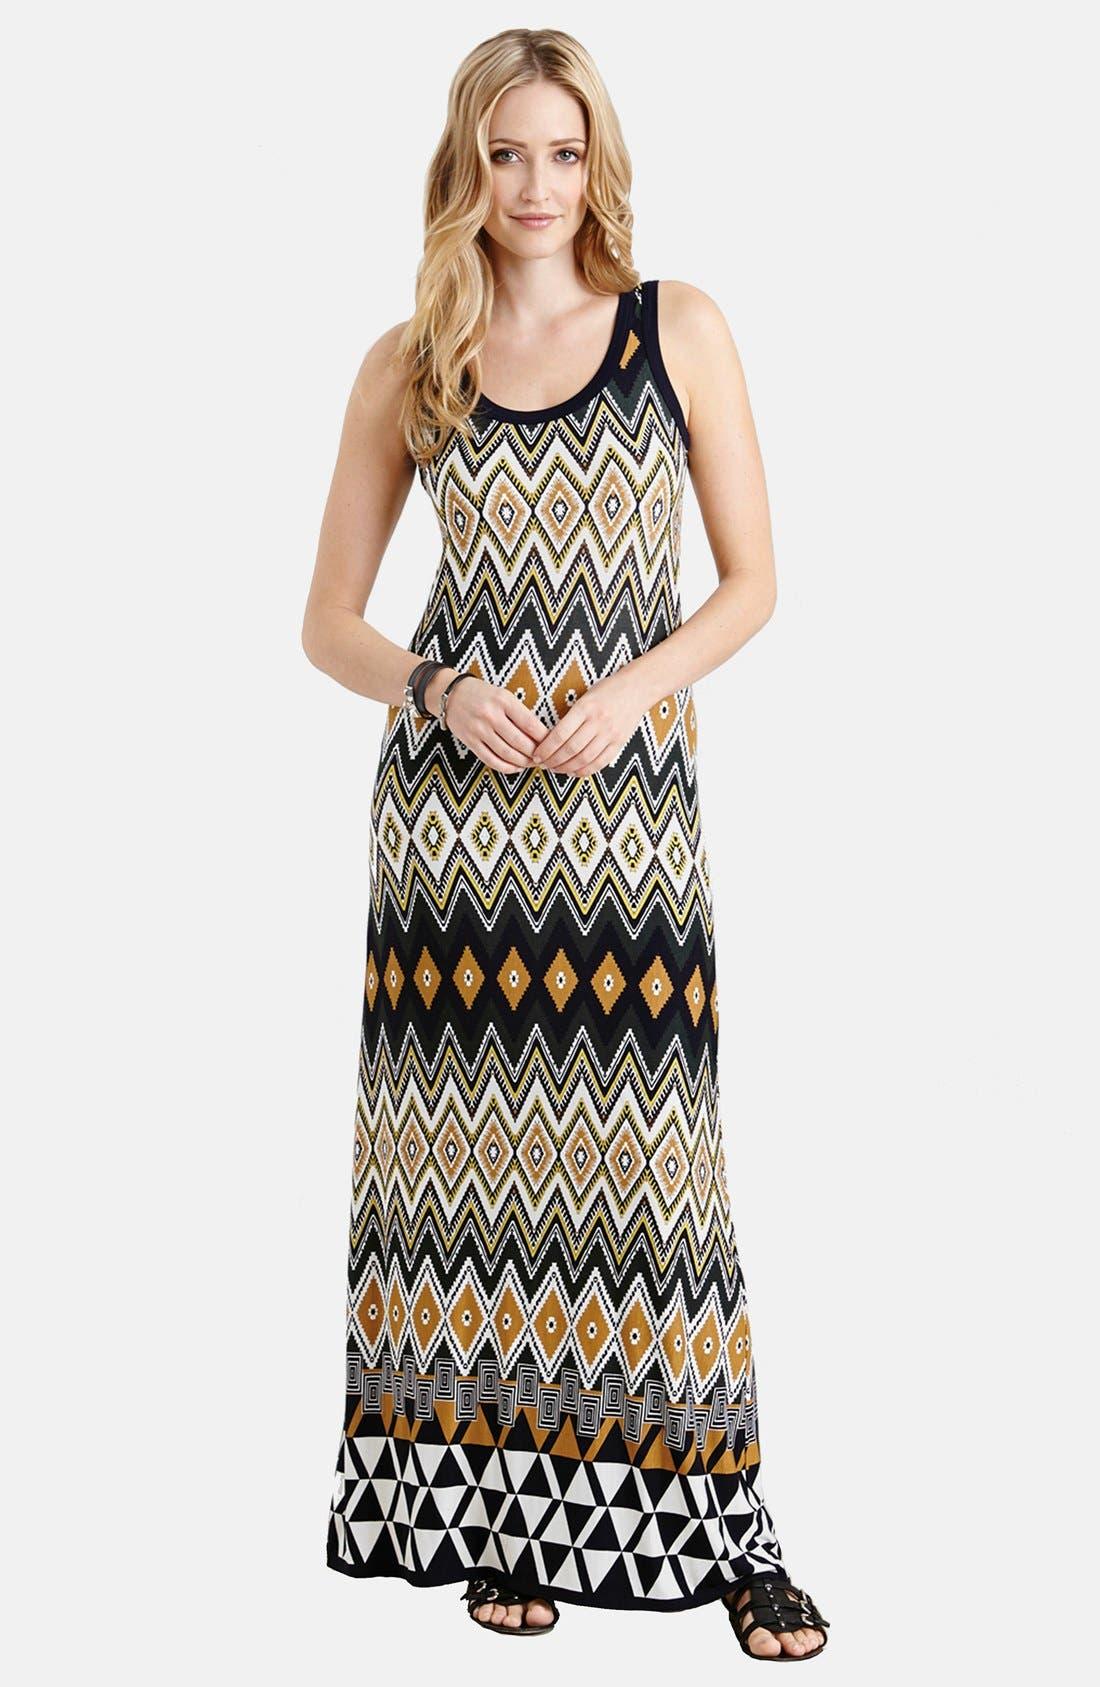 Alternate Image 1 Selected - Karen Kane 'Egyptian Diamond' Print Sleeveless Maxi Dress